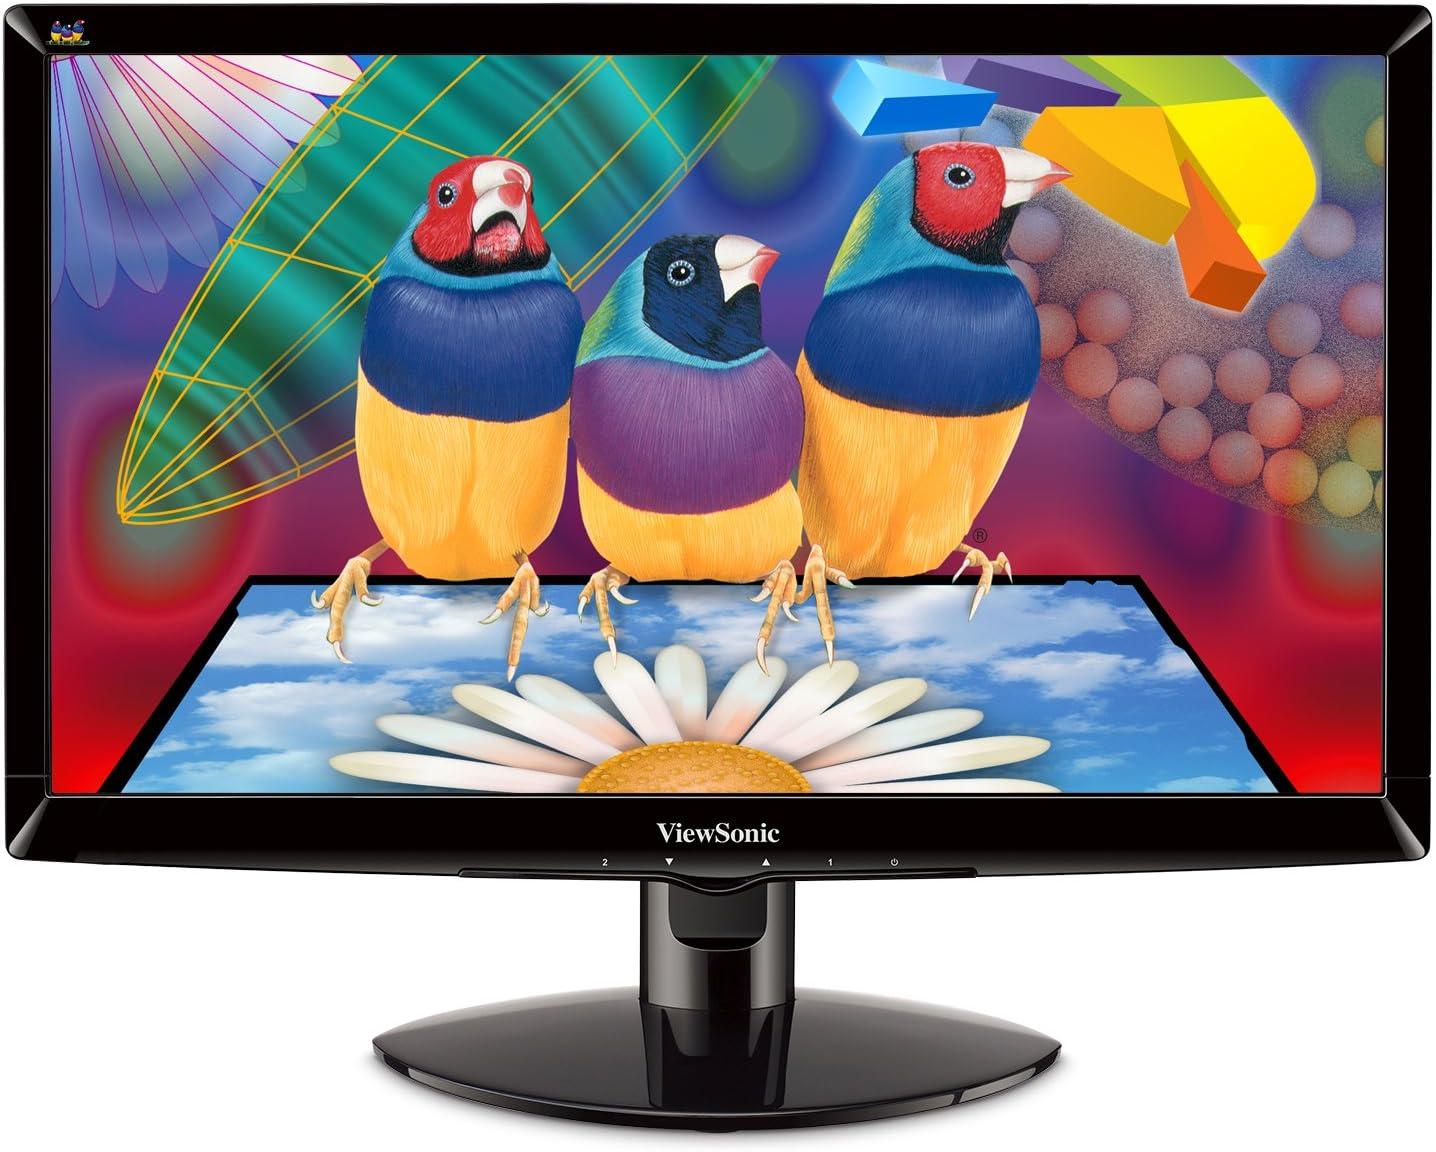 Viewsonic LED LCD VA2037M-LED Pantalla para PC 50,8 cm (20